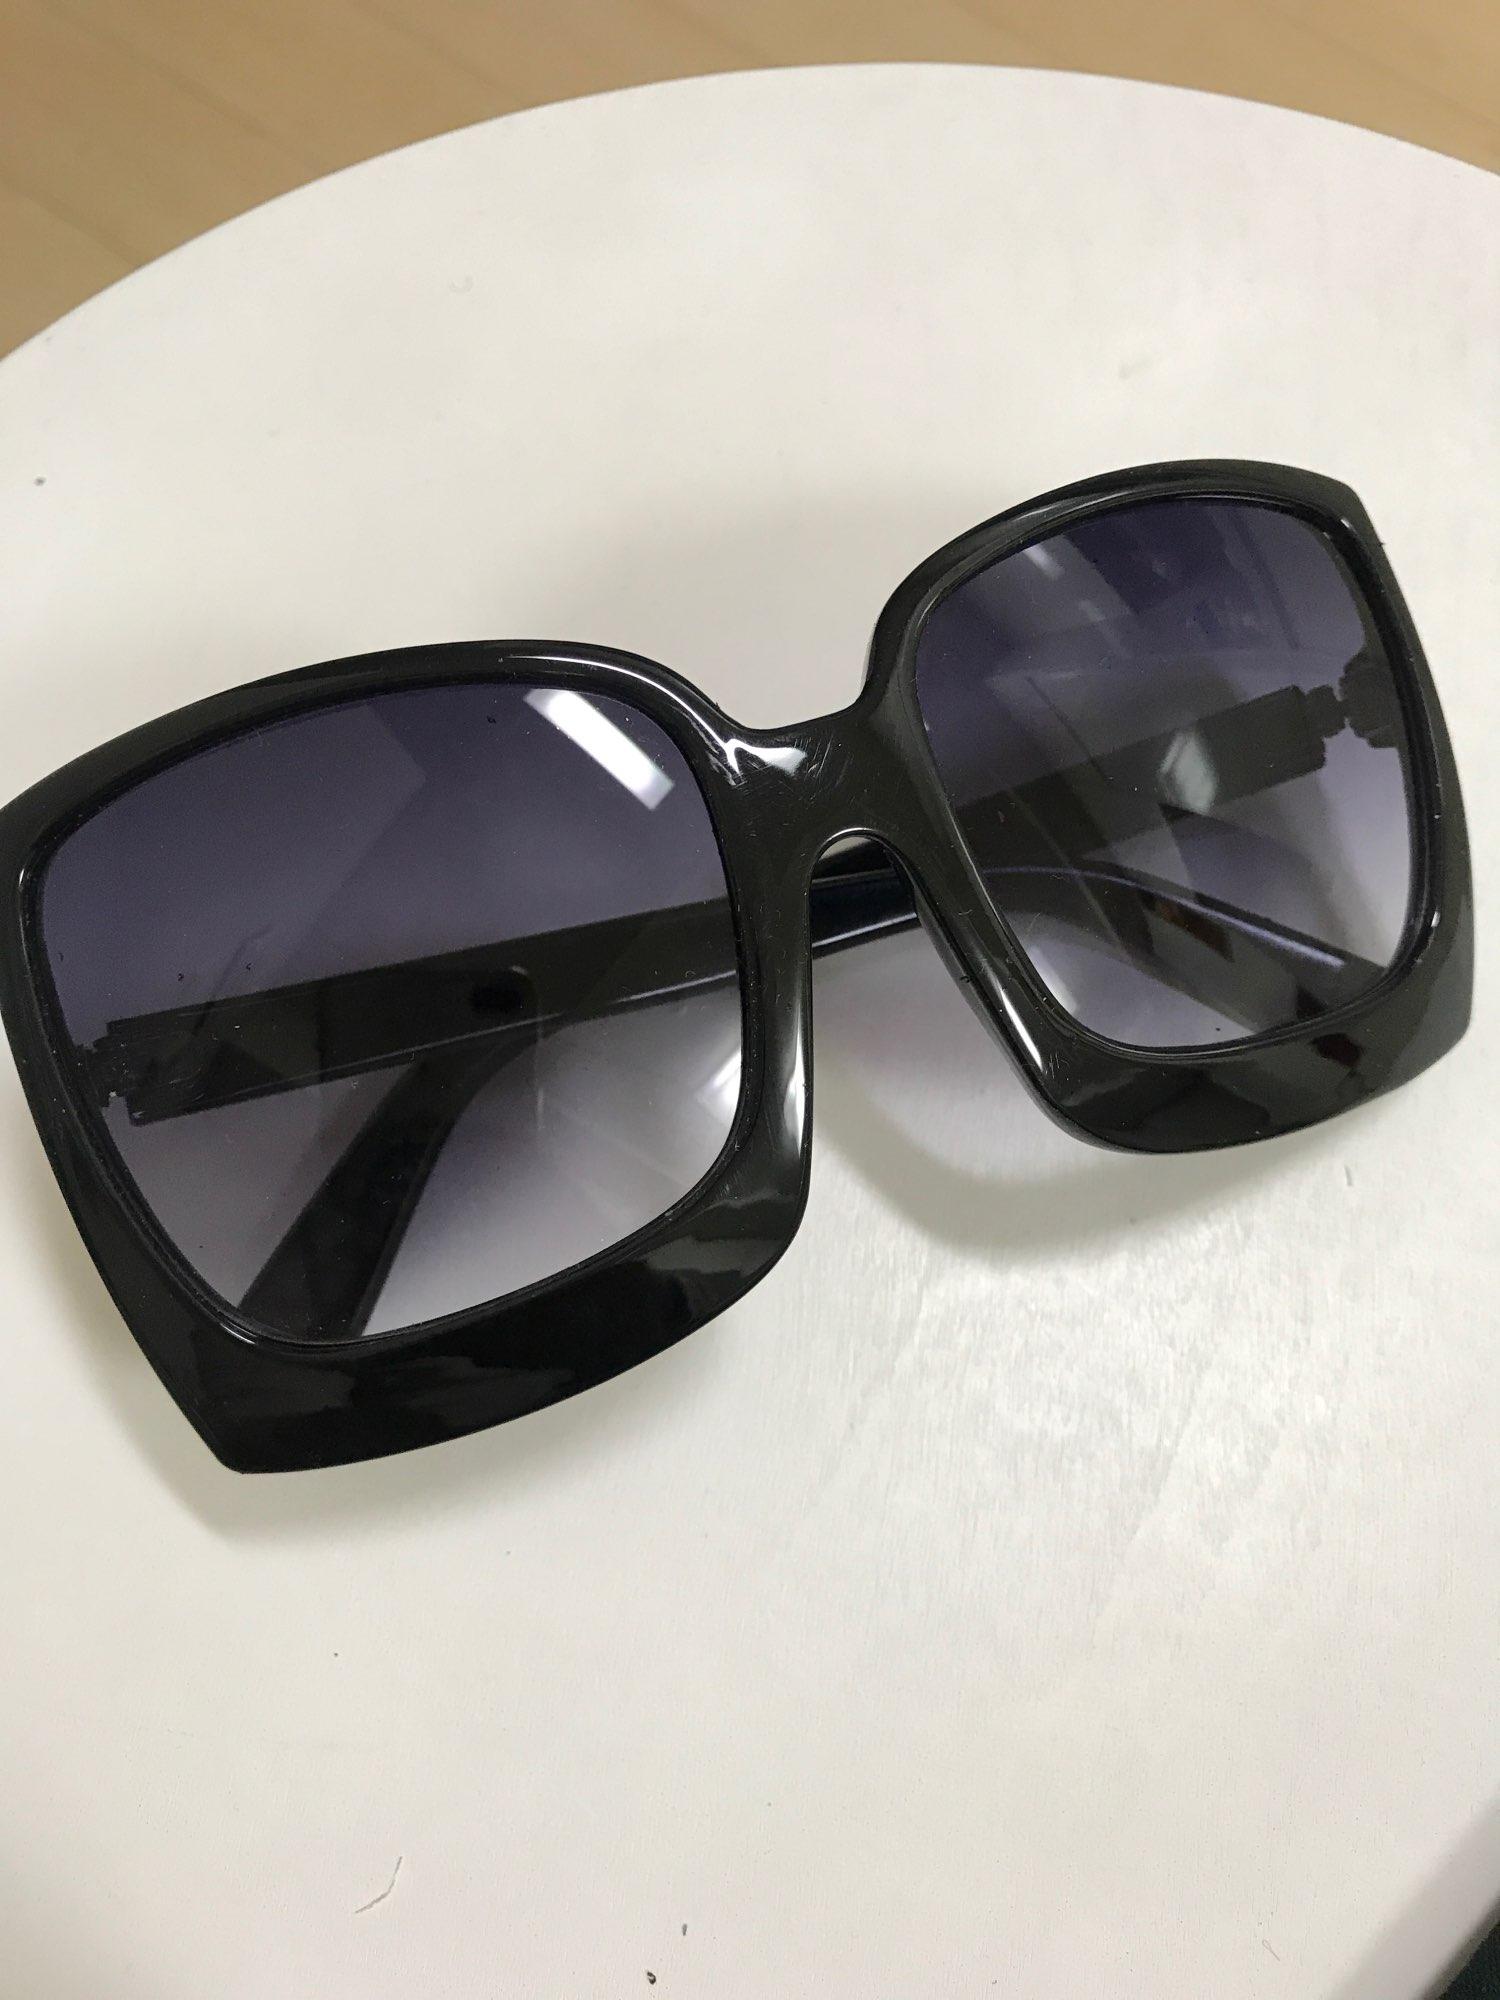 D&T New Fashion Oversized Women Sunglasses - Designer Brand Big Frame Gradient Sun Glasses UV400 photo review